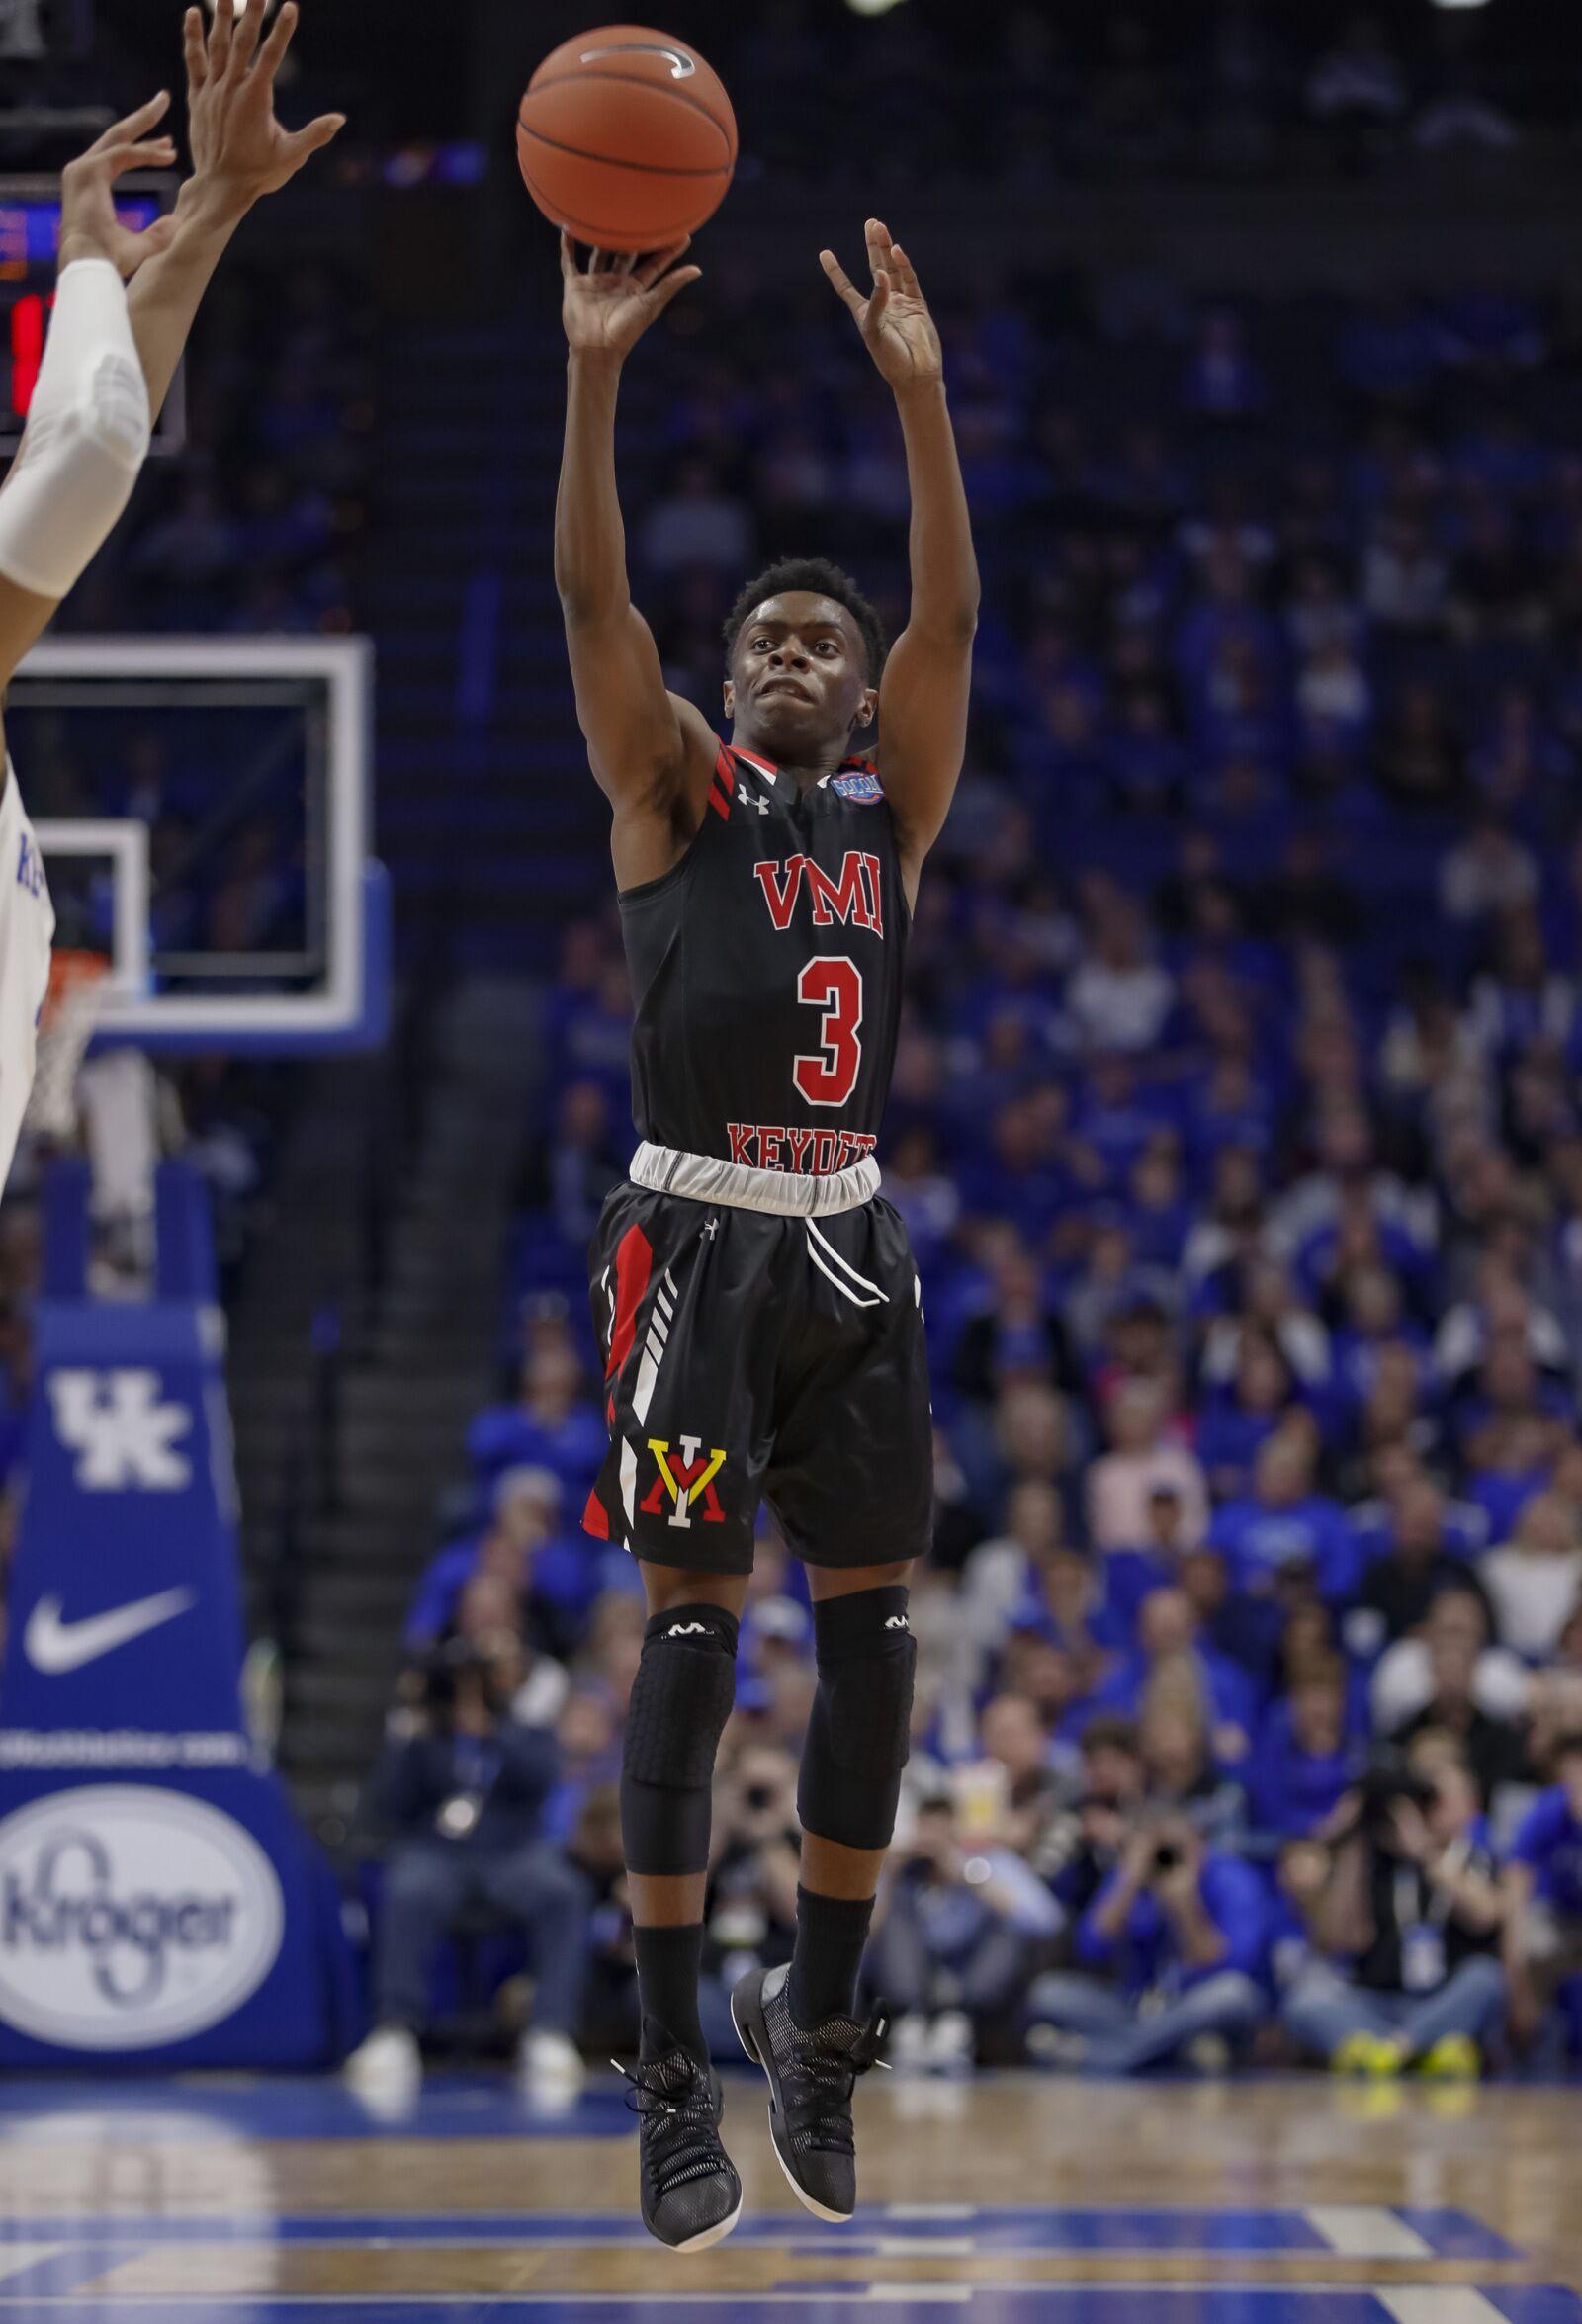 Georgia Tech Basketball: Jackets add a much-needed scorer in Bubba Parham